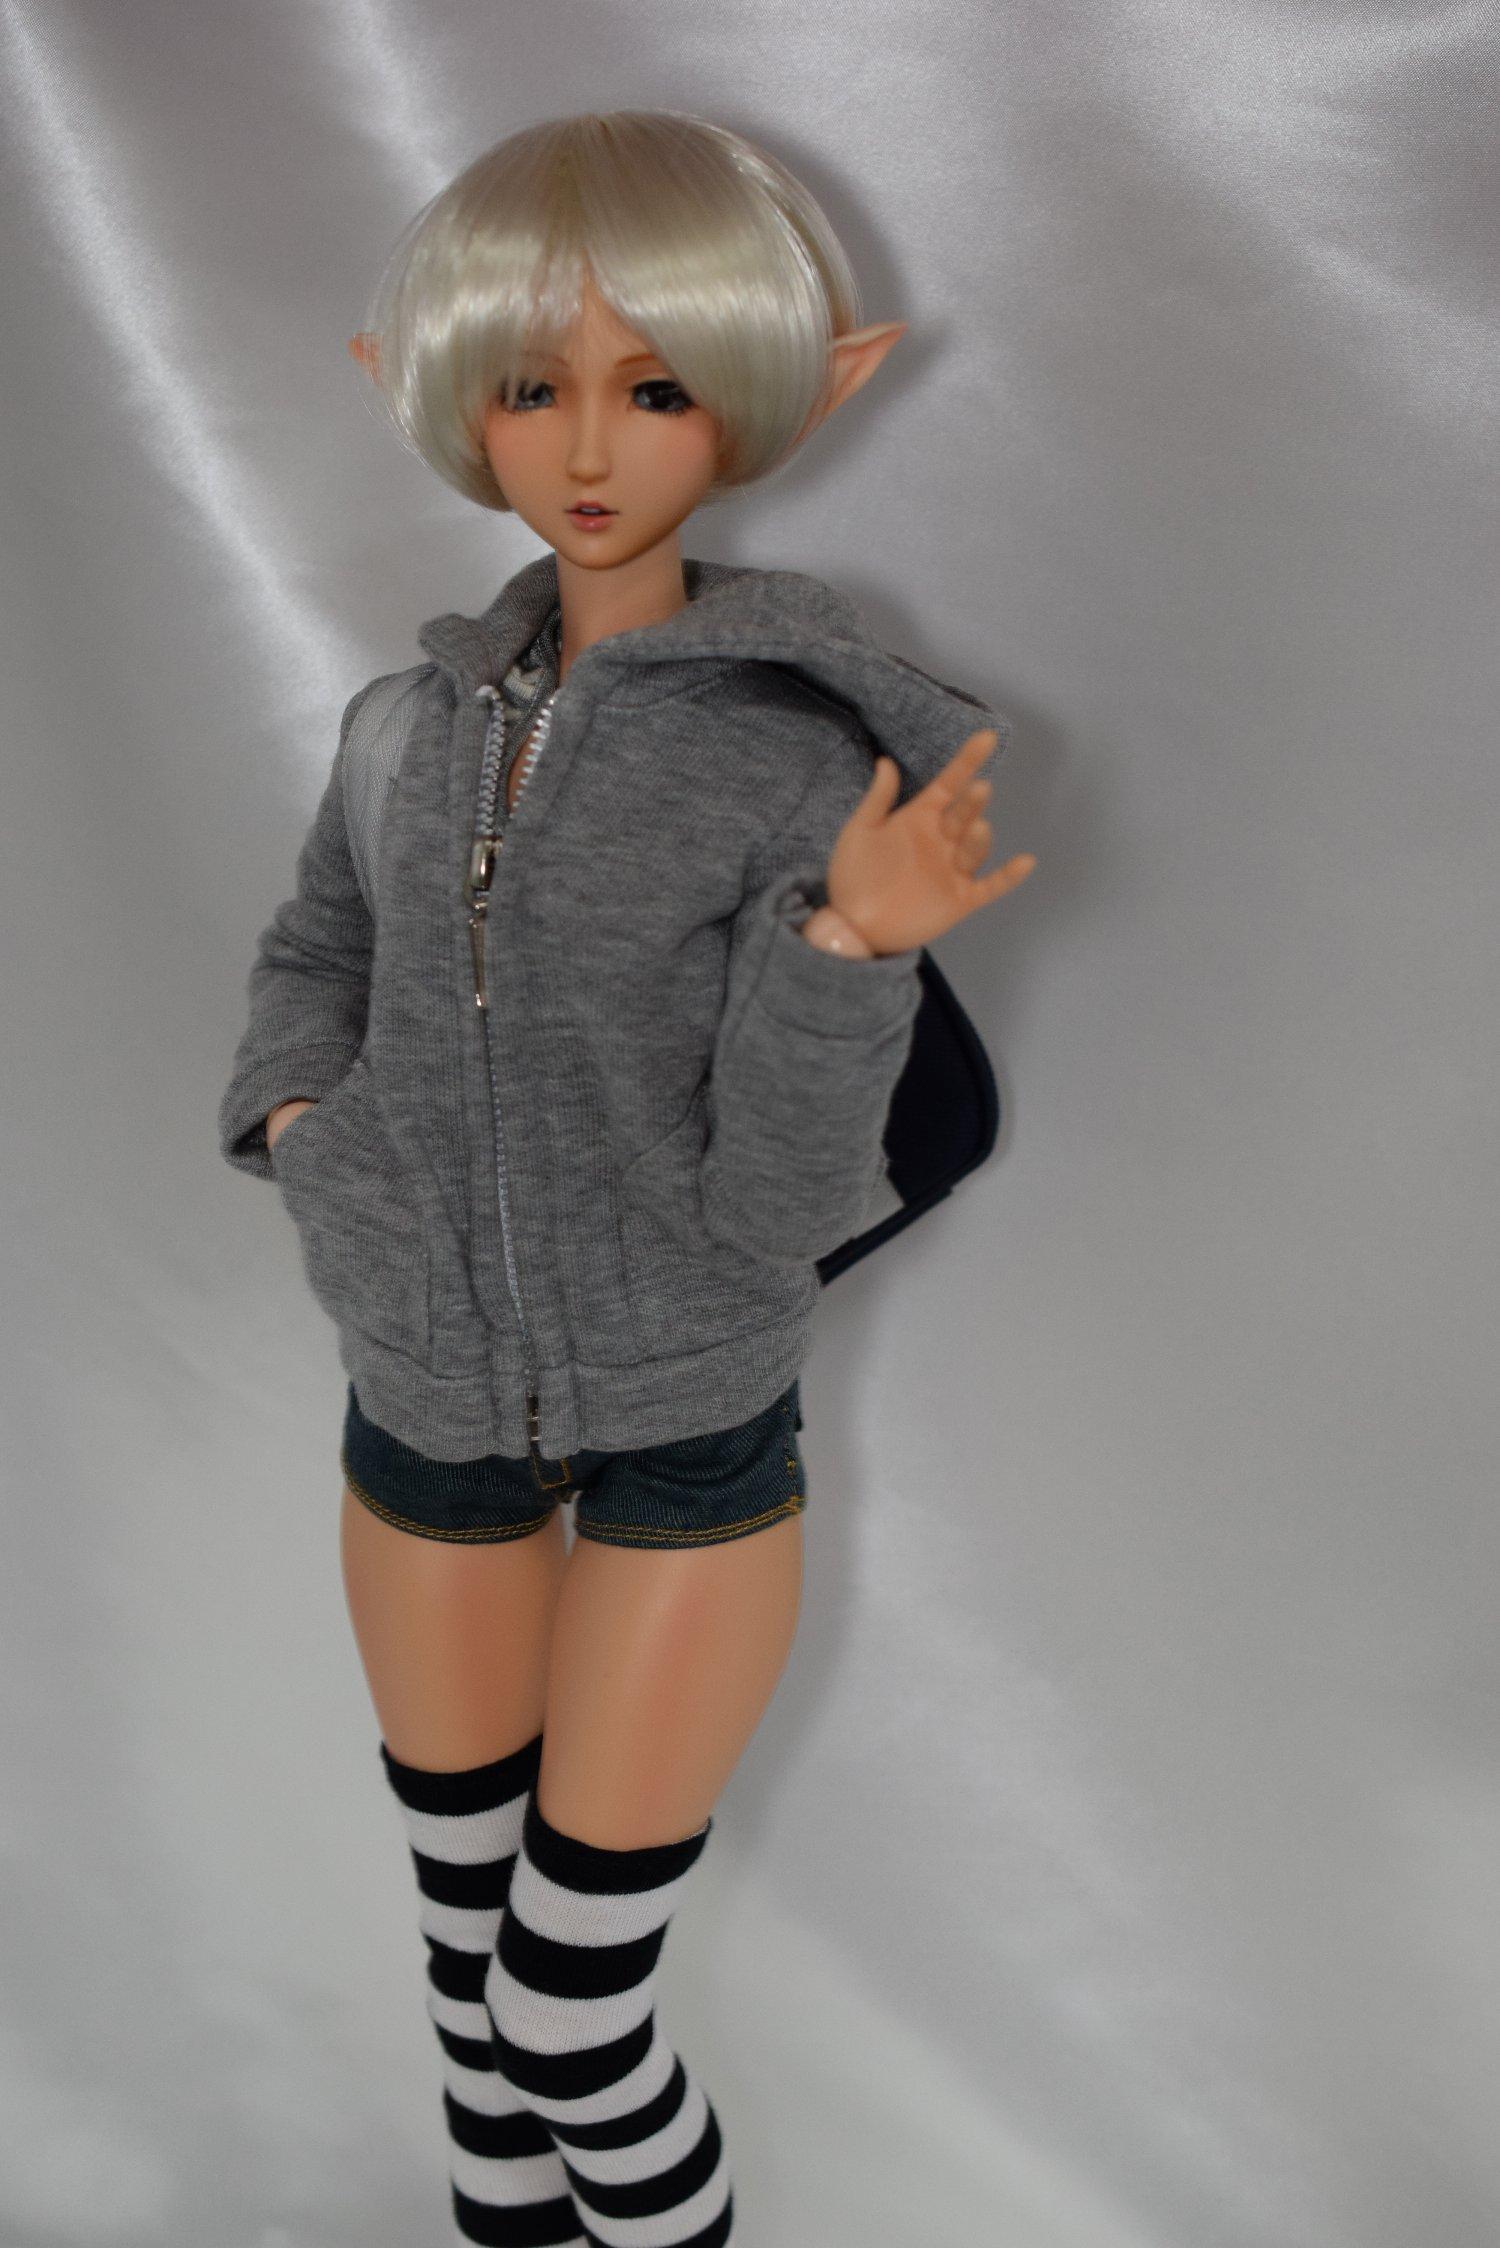 doll_2478.jpg